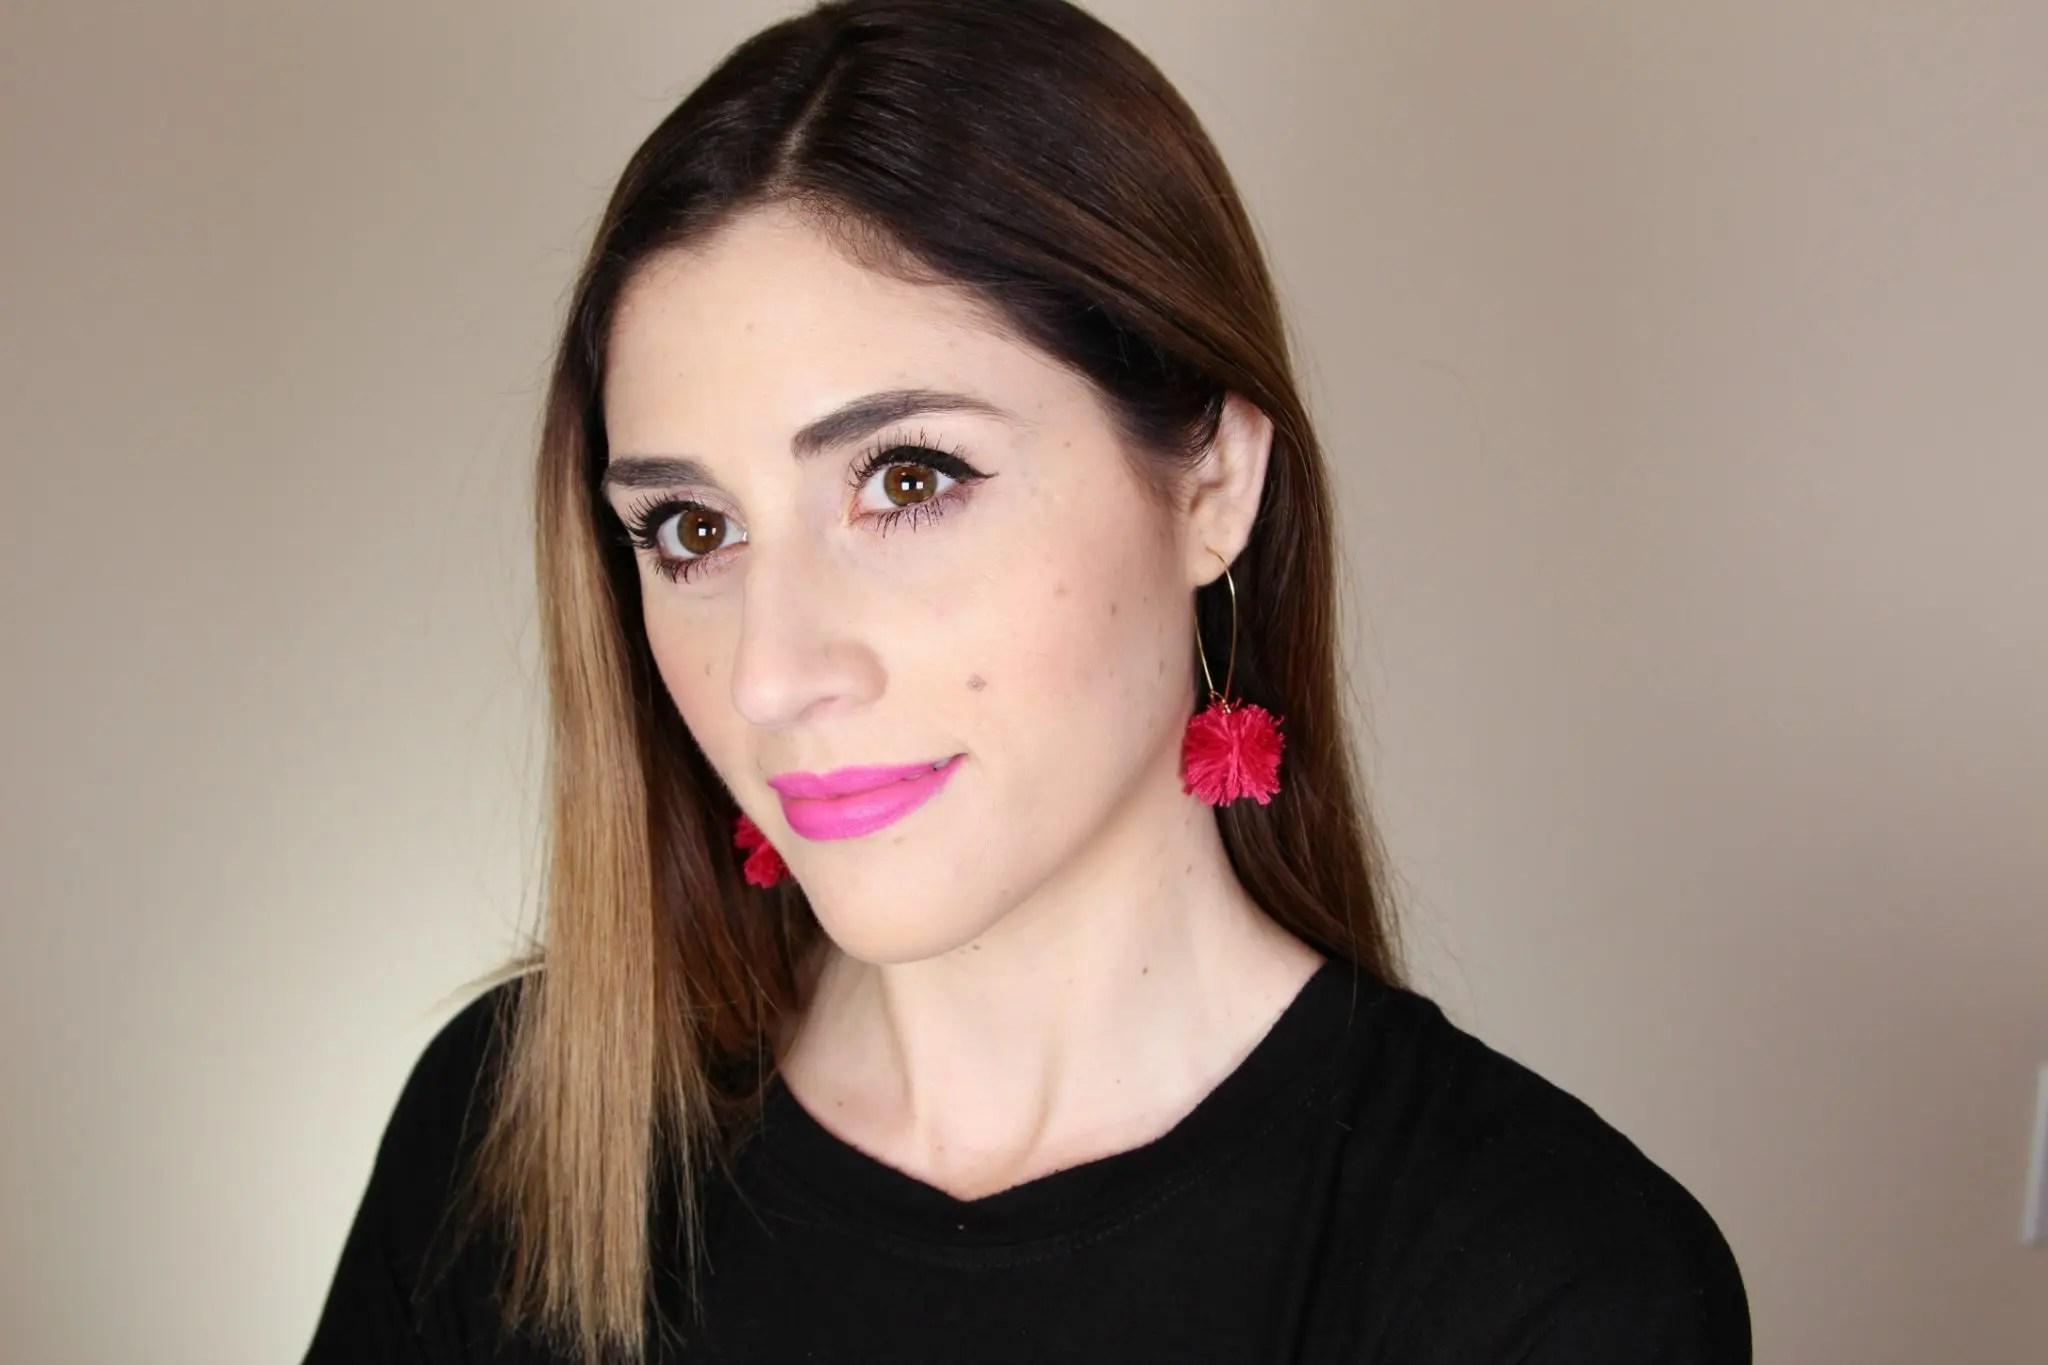 DIY Pom Pom Earrings   How to Make fun pompom earrings